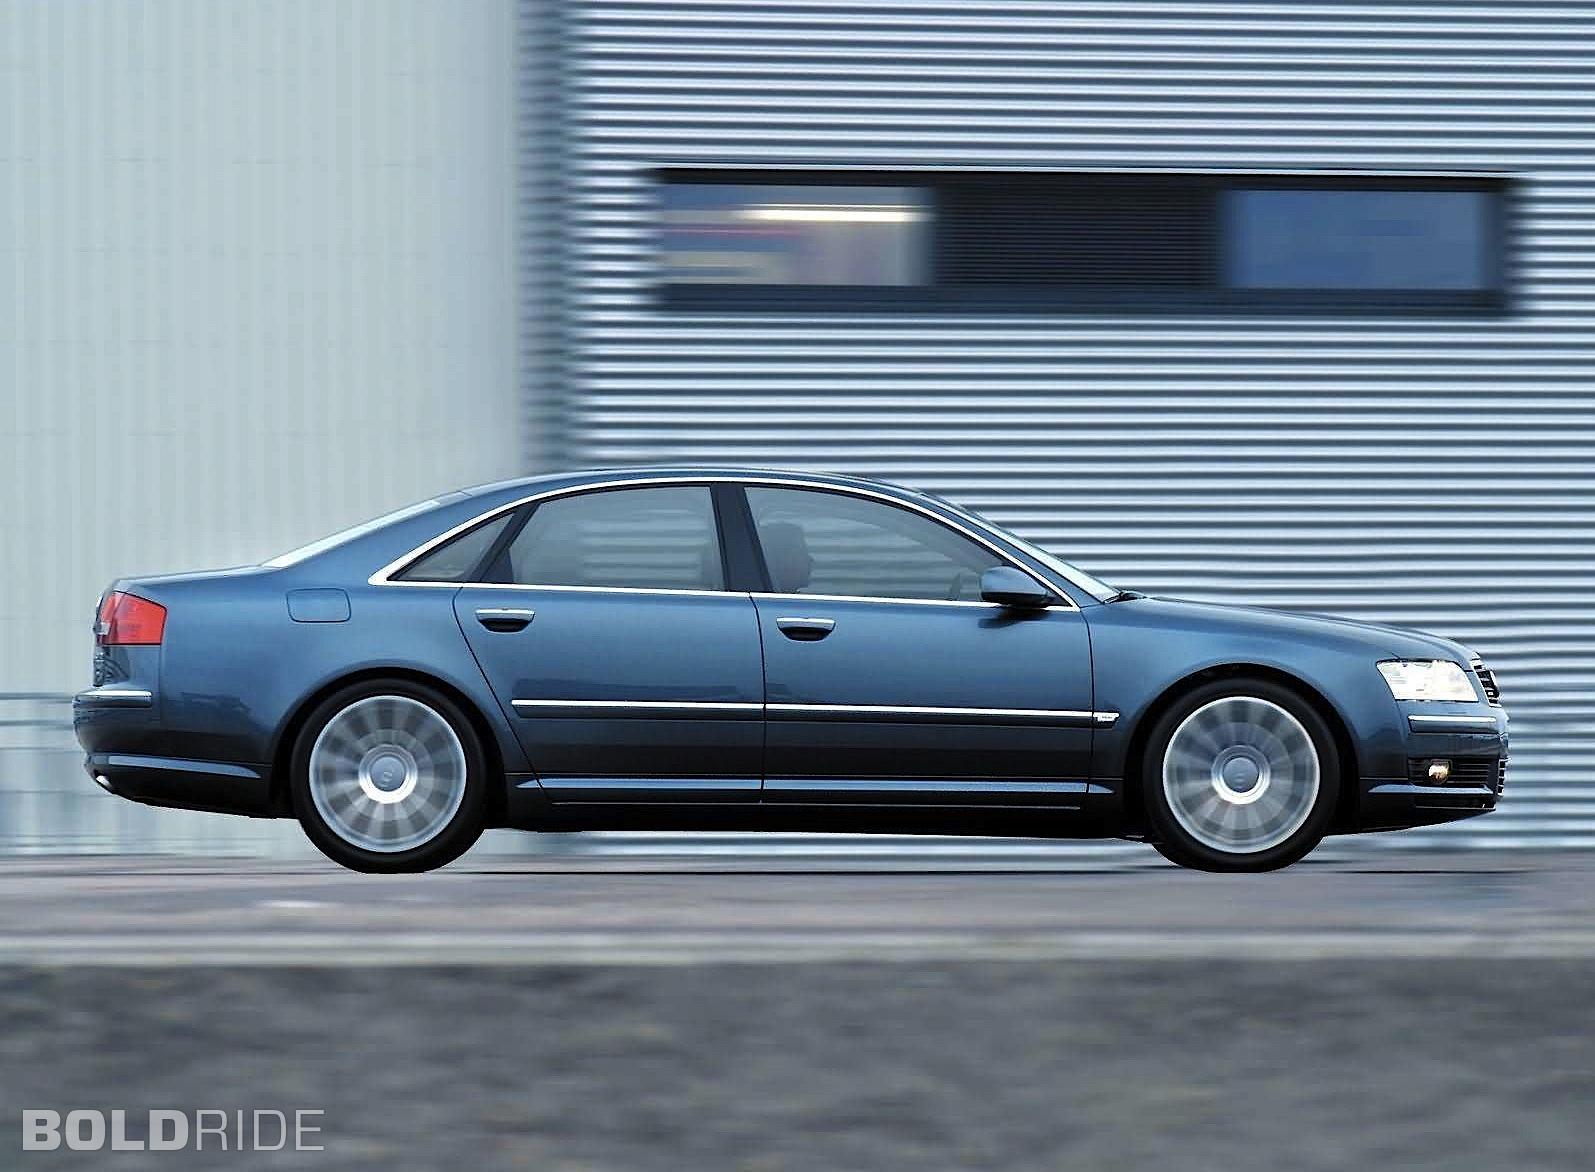 2003 Audi A8 Image 20